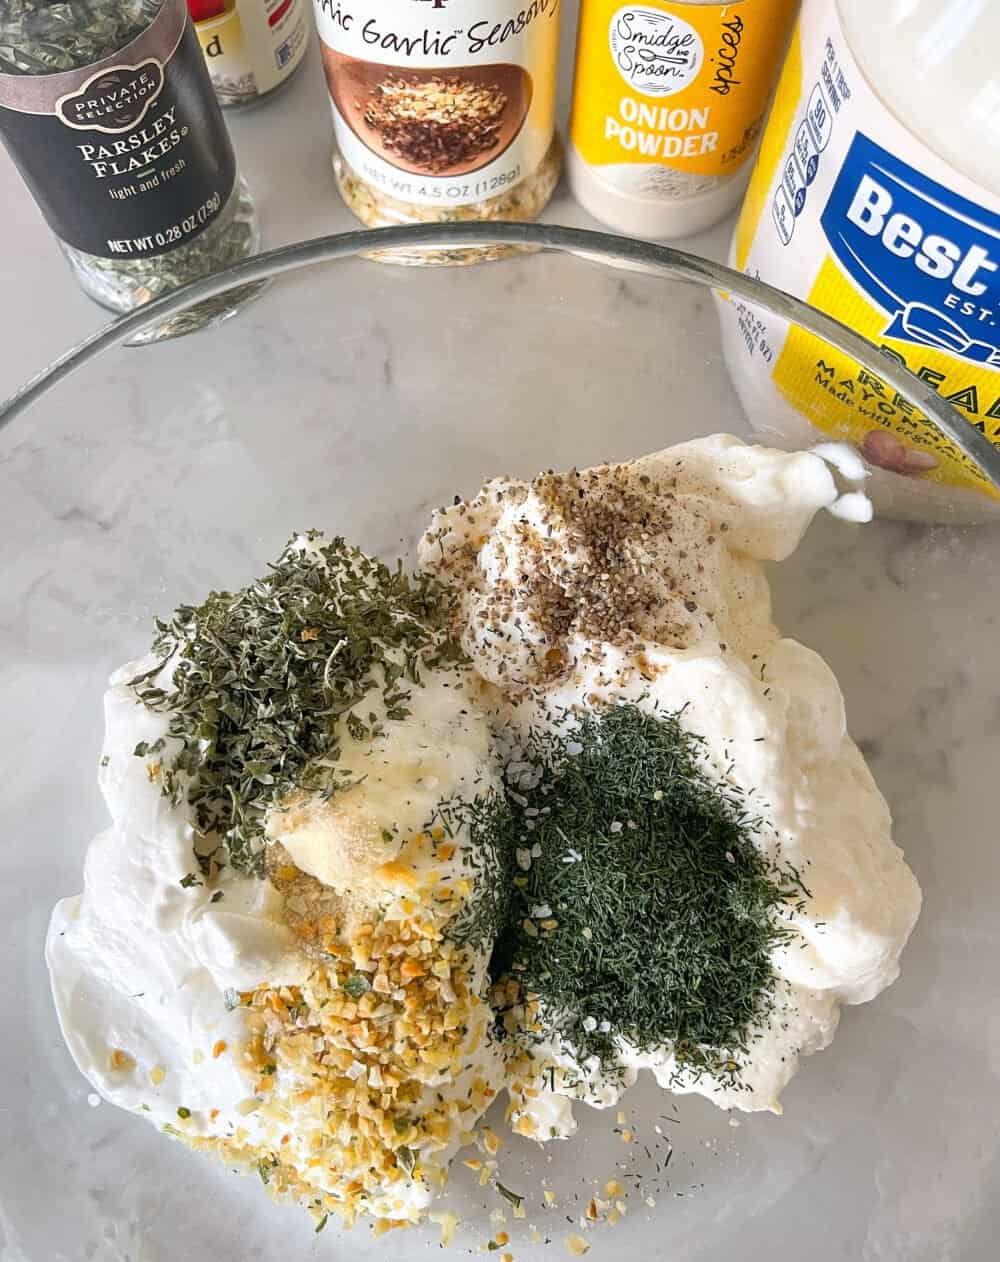 veggie dip ingredients in mixing bowl